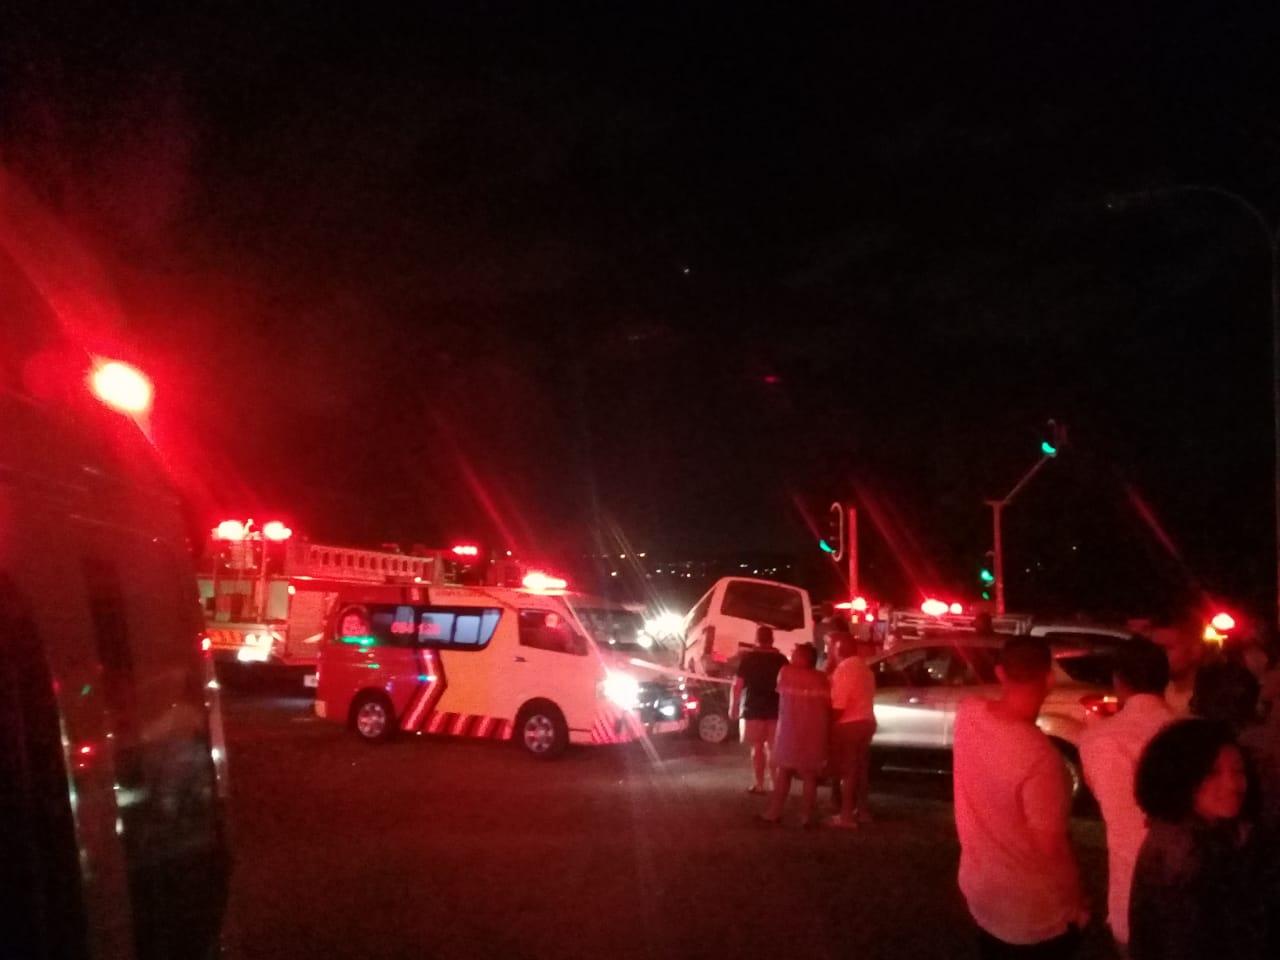 17 Injured after taxi and bakkie collide in Brackendowns, Alberton